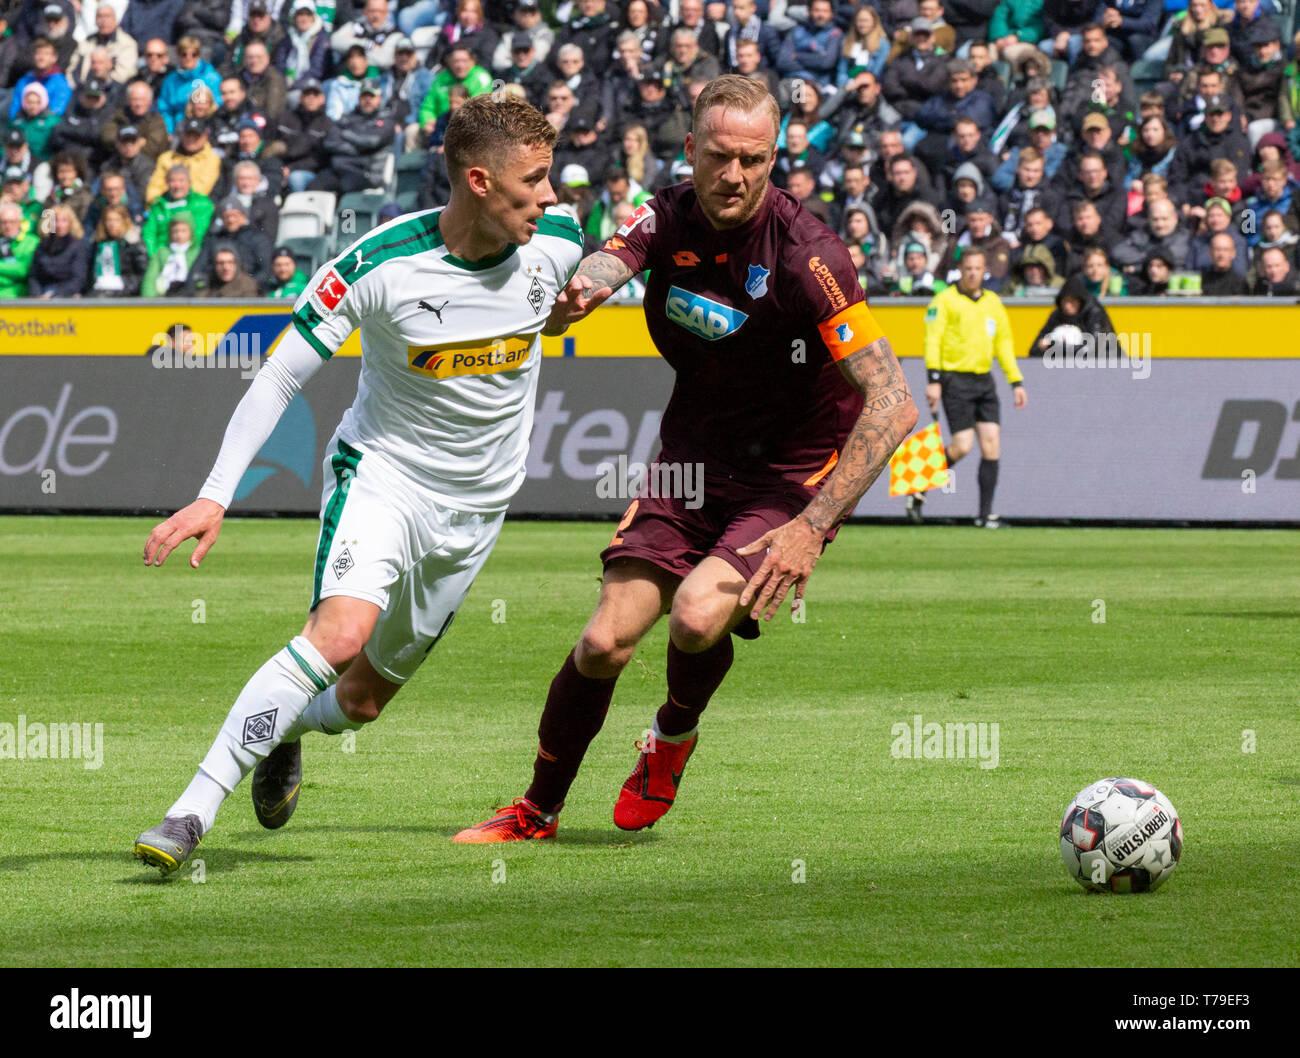 sports, football, Bundesliga, 2018/2019, Borussia Moenchengladbach vs. TSG 1899 Hoffenheim 2-2, Stadium Borussia Park, scene of the match, Thorgan Hazard (MG) left and team captain Kevin Vogt (TSG), DFL REGULATIONS PROHIBIT ANY USE OF PHOTOGRAPHS AS IMAGE SEQUENCES AND/OR QUASI-VIDEO - Stock Image